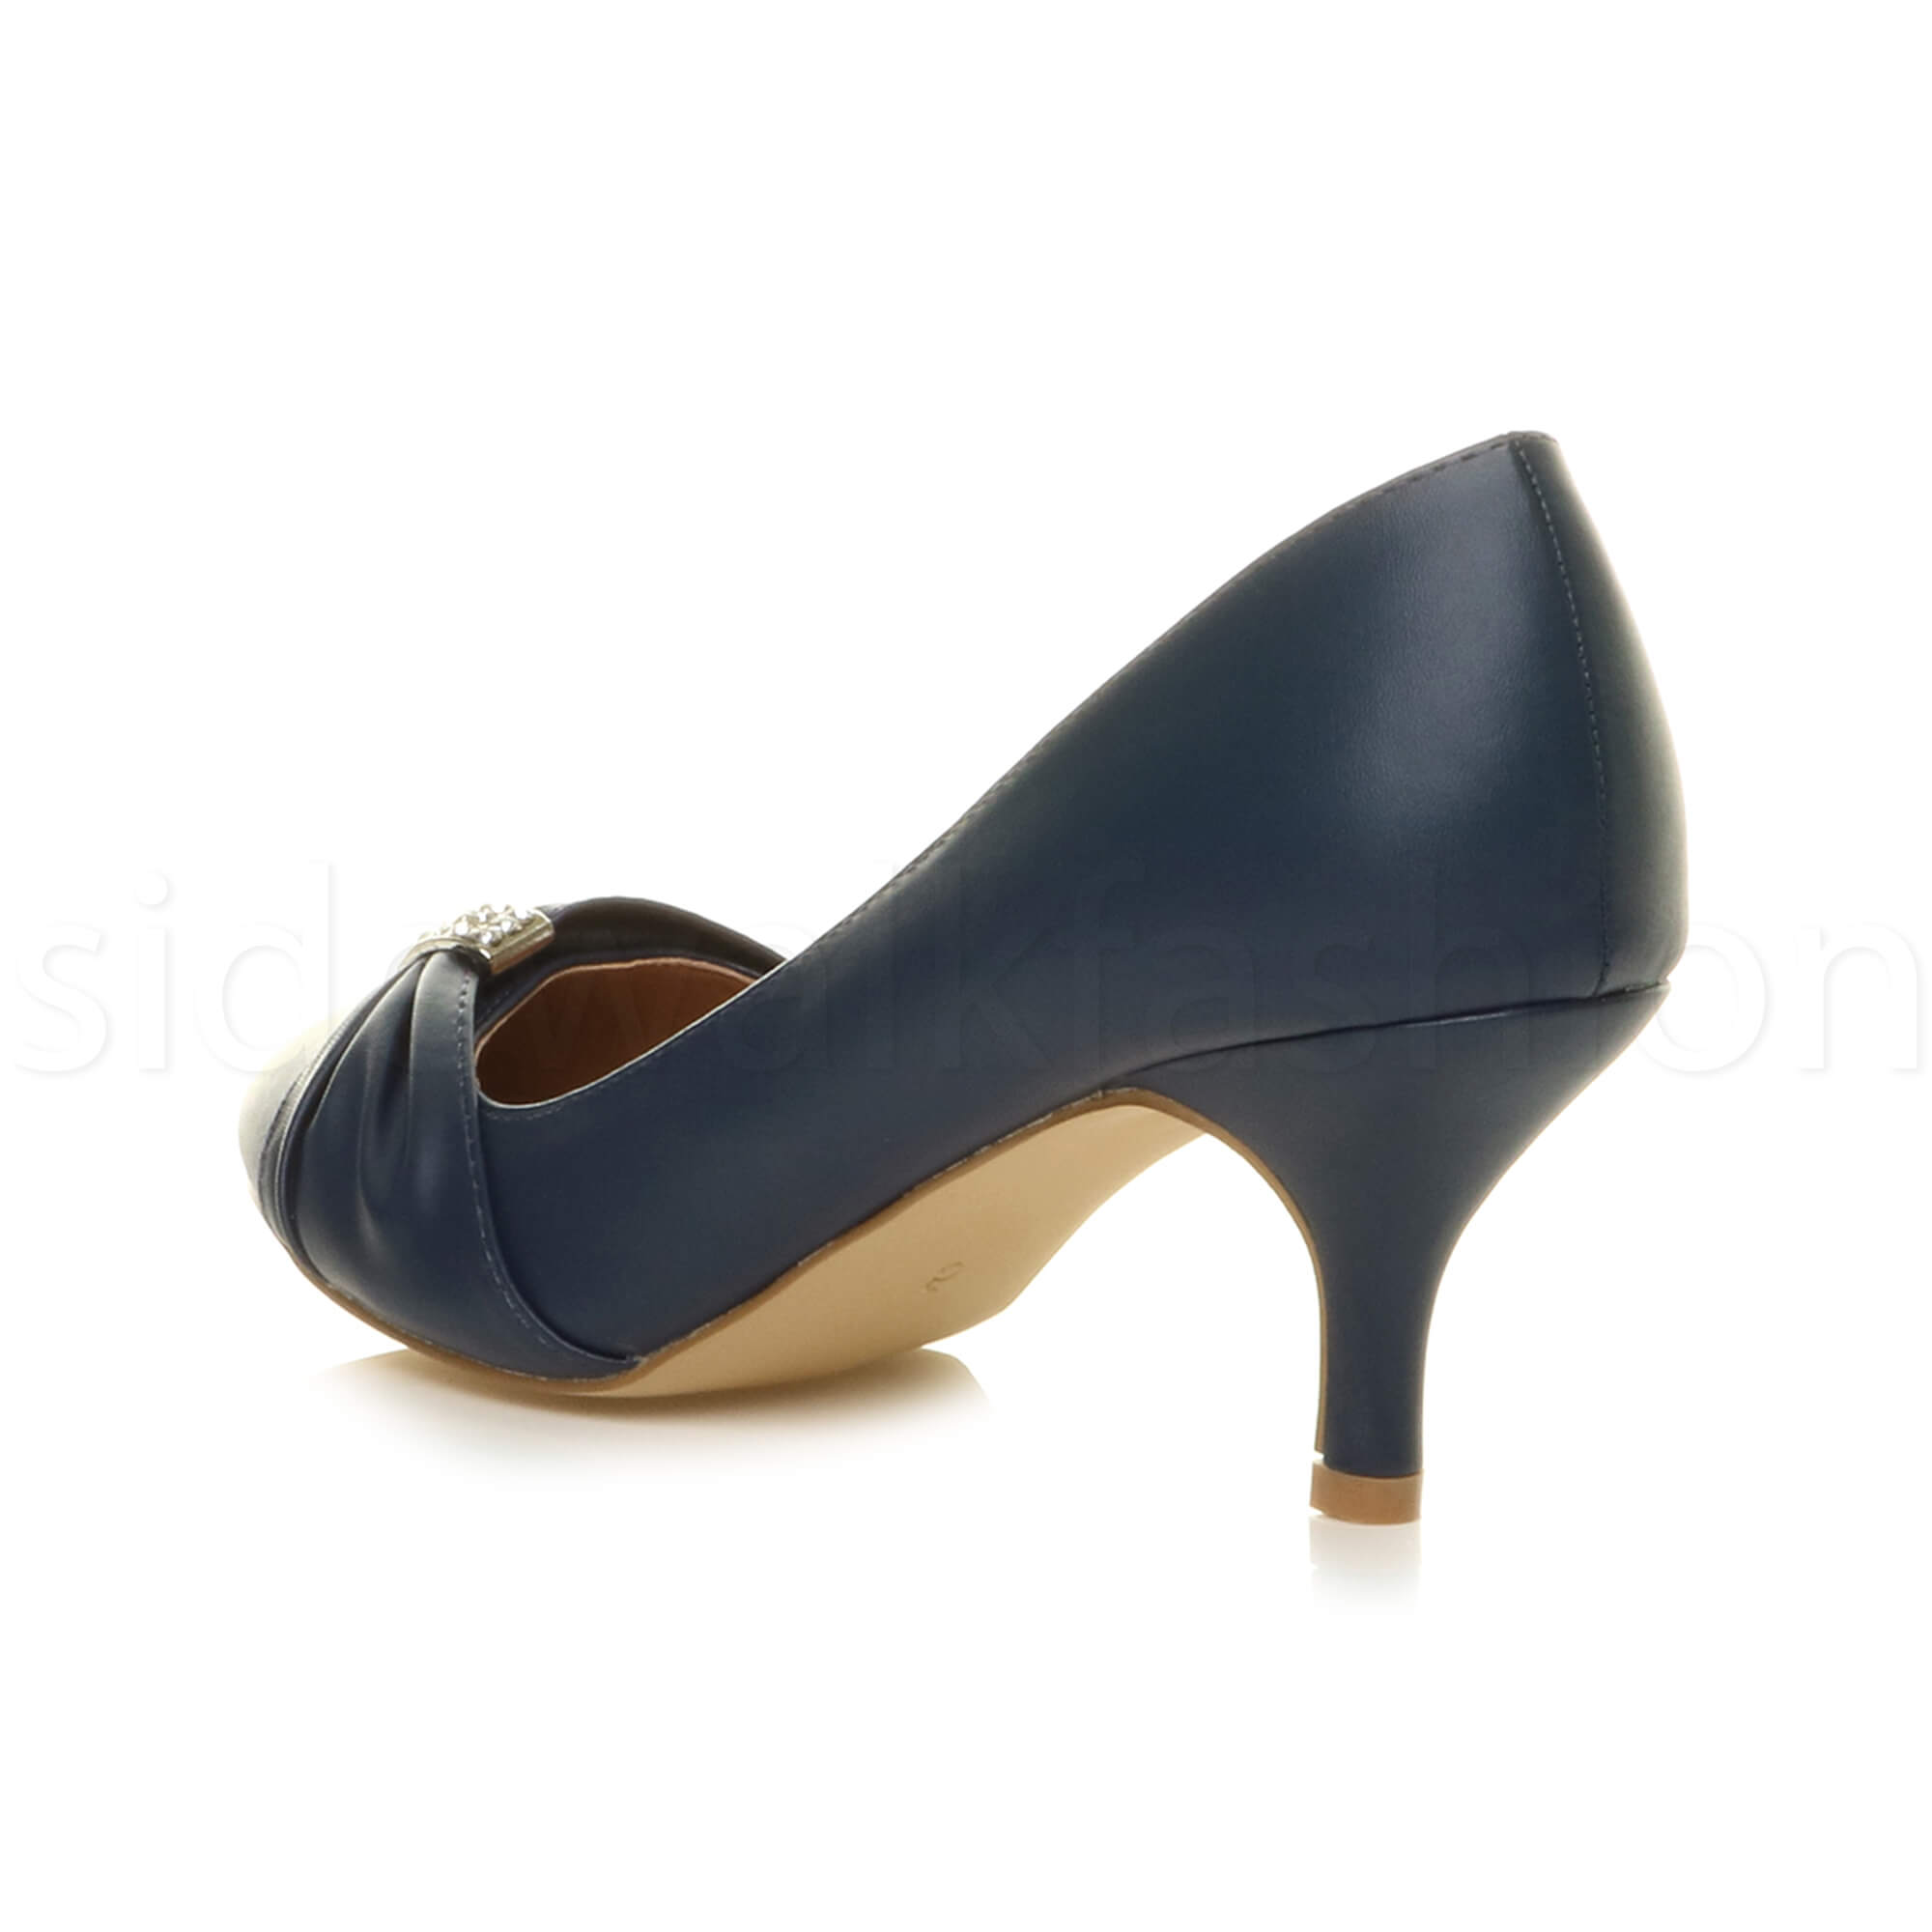 Womens-ladies-low-mid-heel-diamante-party-smart-evening-court-shoes-size thumbnail 45